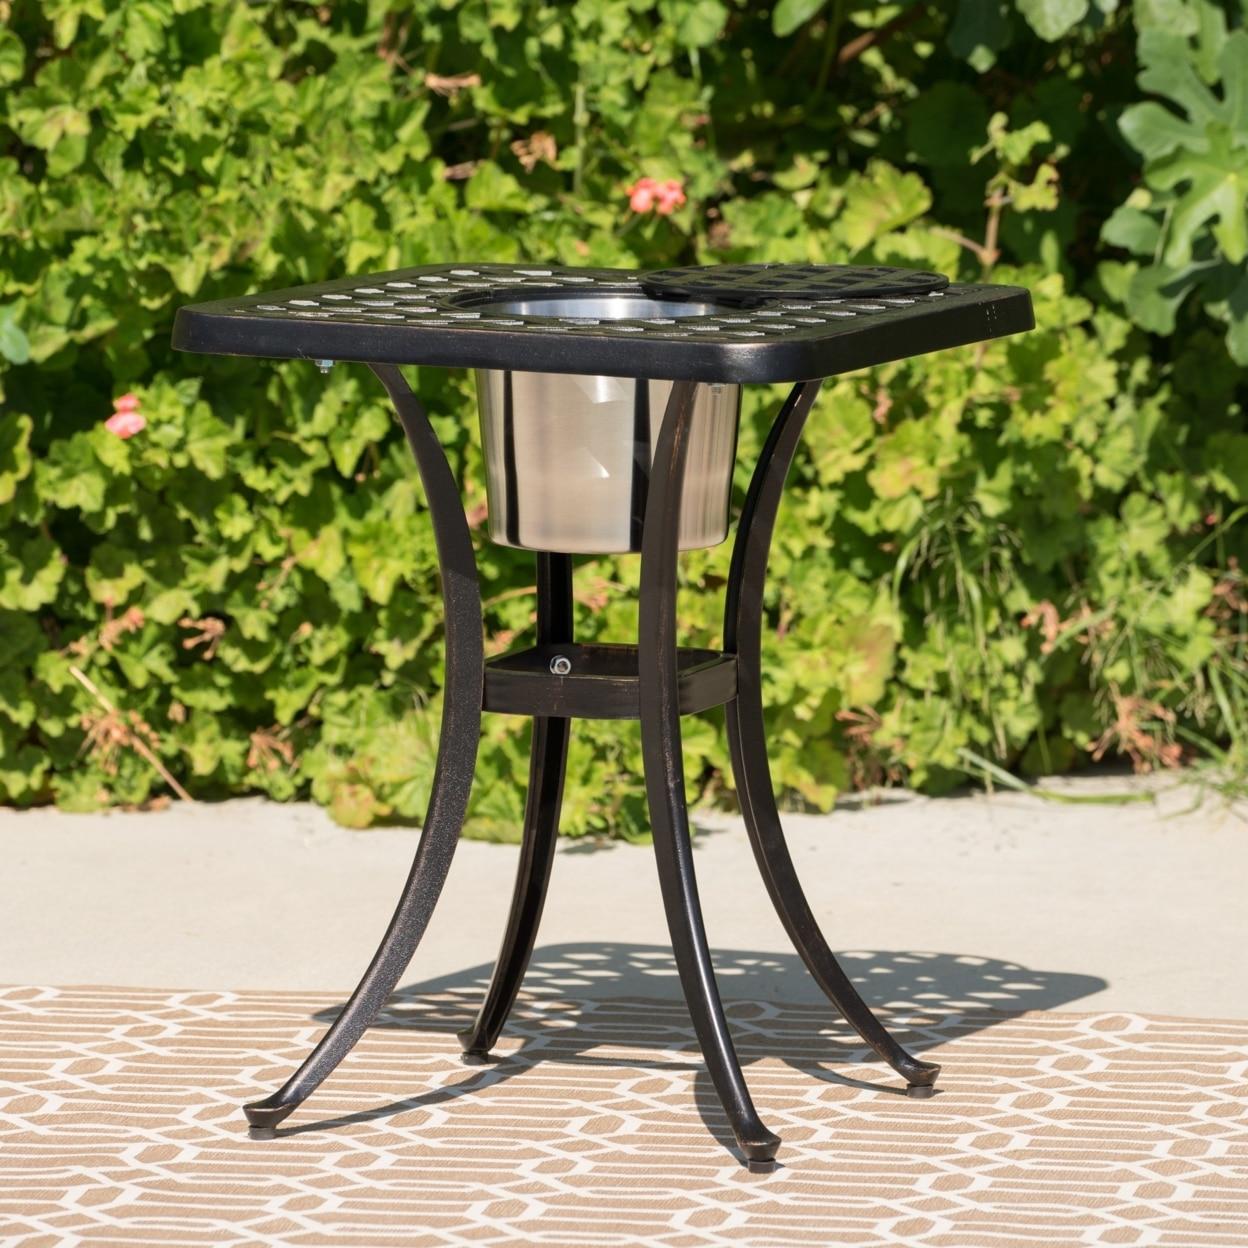 Ariel Outdoor Patina Copper Bistro Table with Ice Bucket колесные диски replica legeartis pr13 8x18 5x112 d66 6 et21 bkf